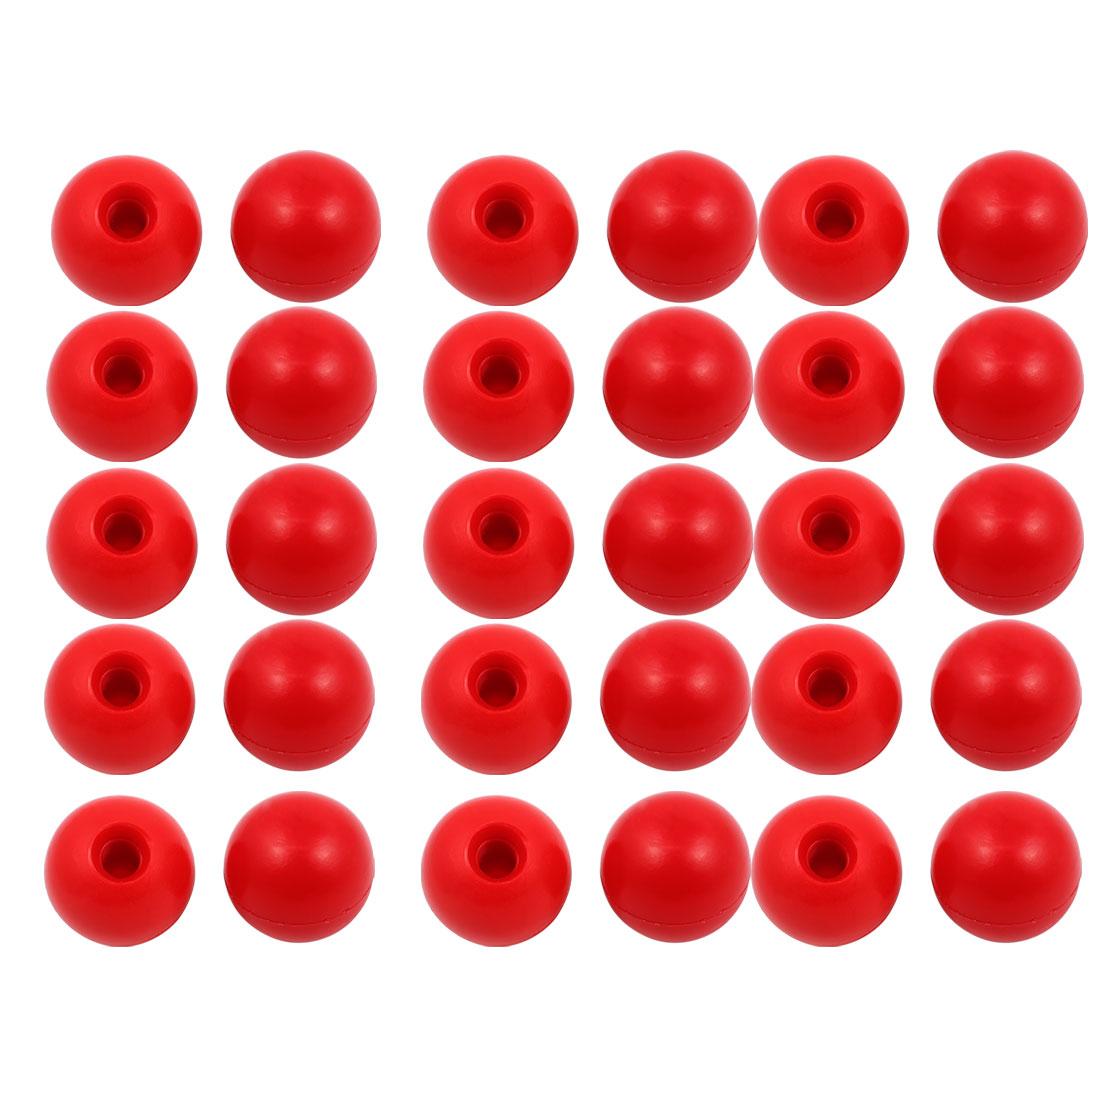 30Pcs Red Plastic Round Handle Ball Knob M10 Threaded 35mm Dia Machine Tools